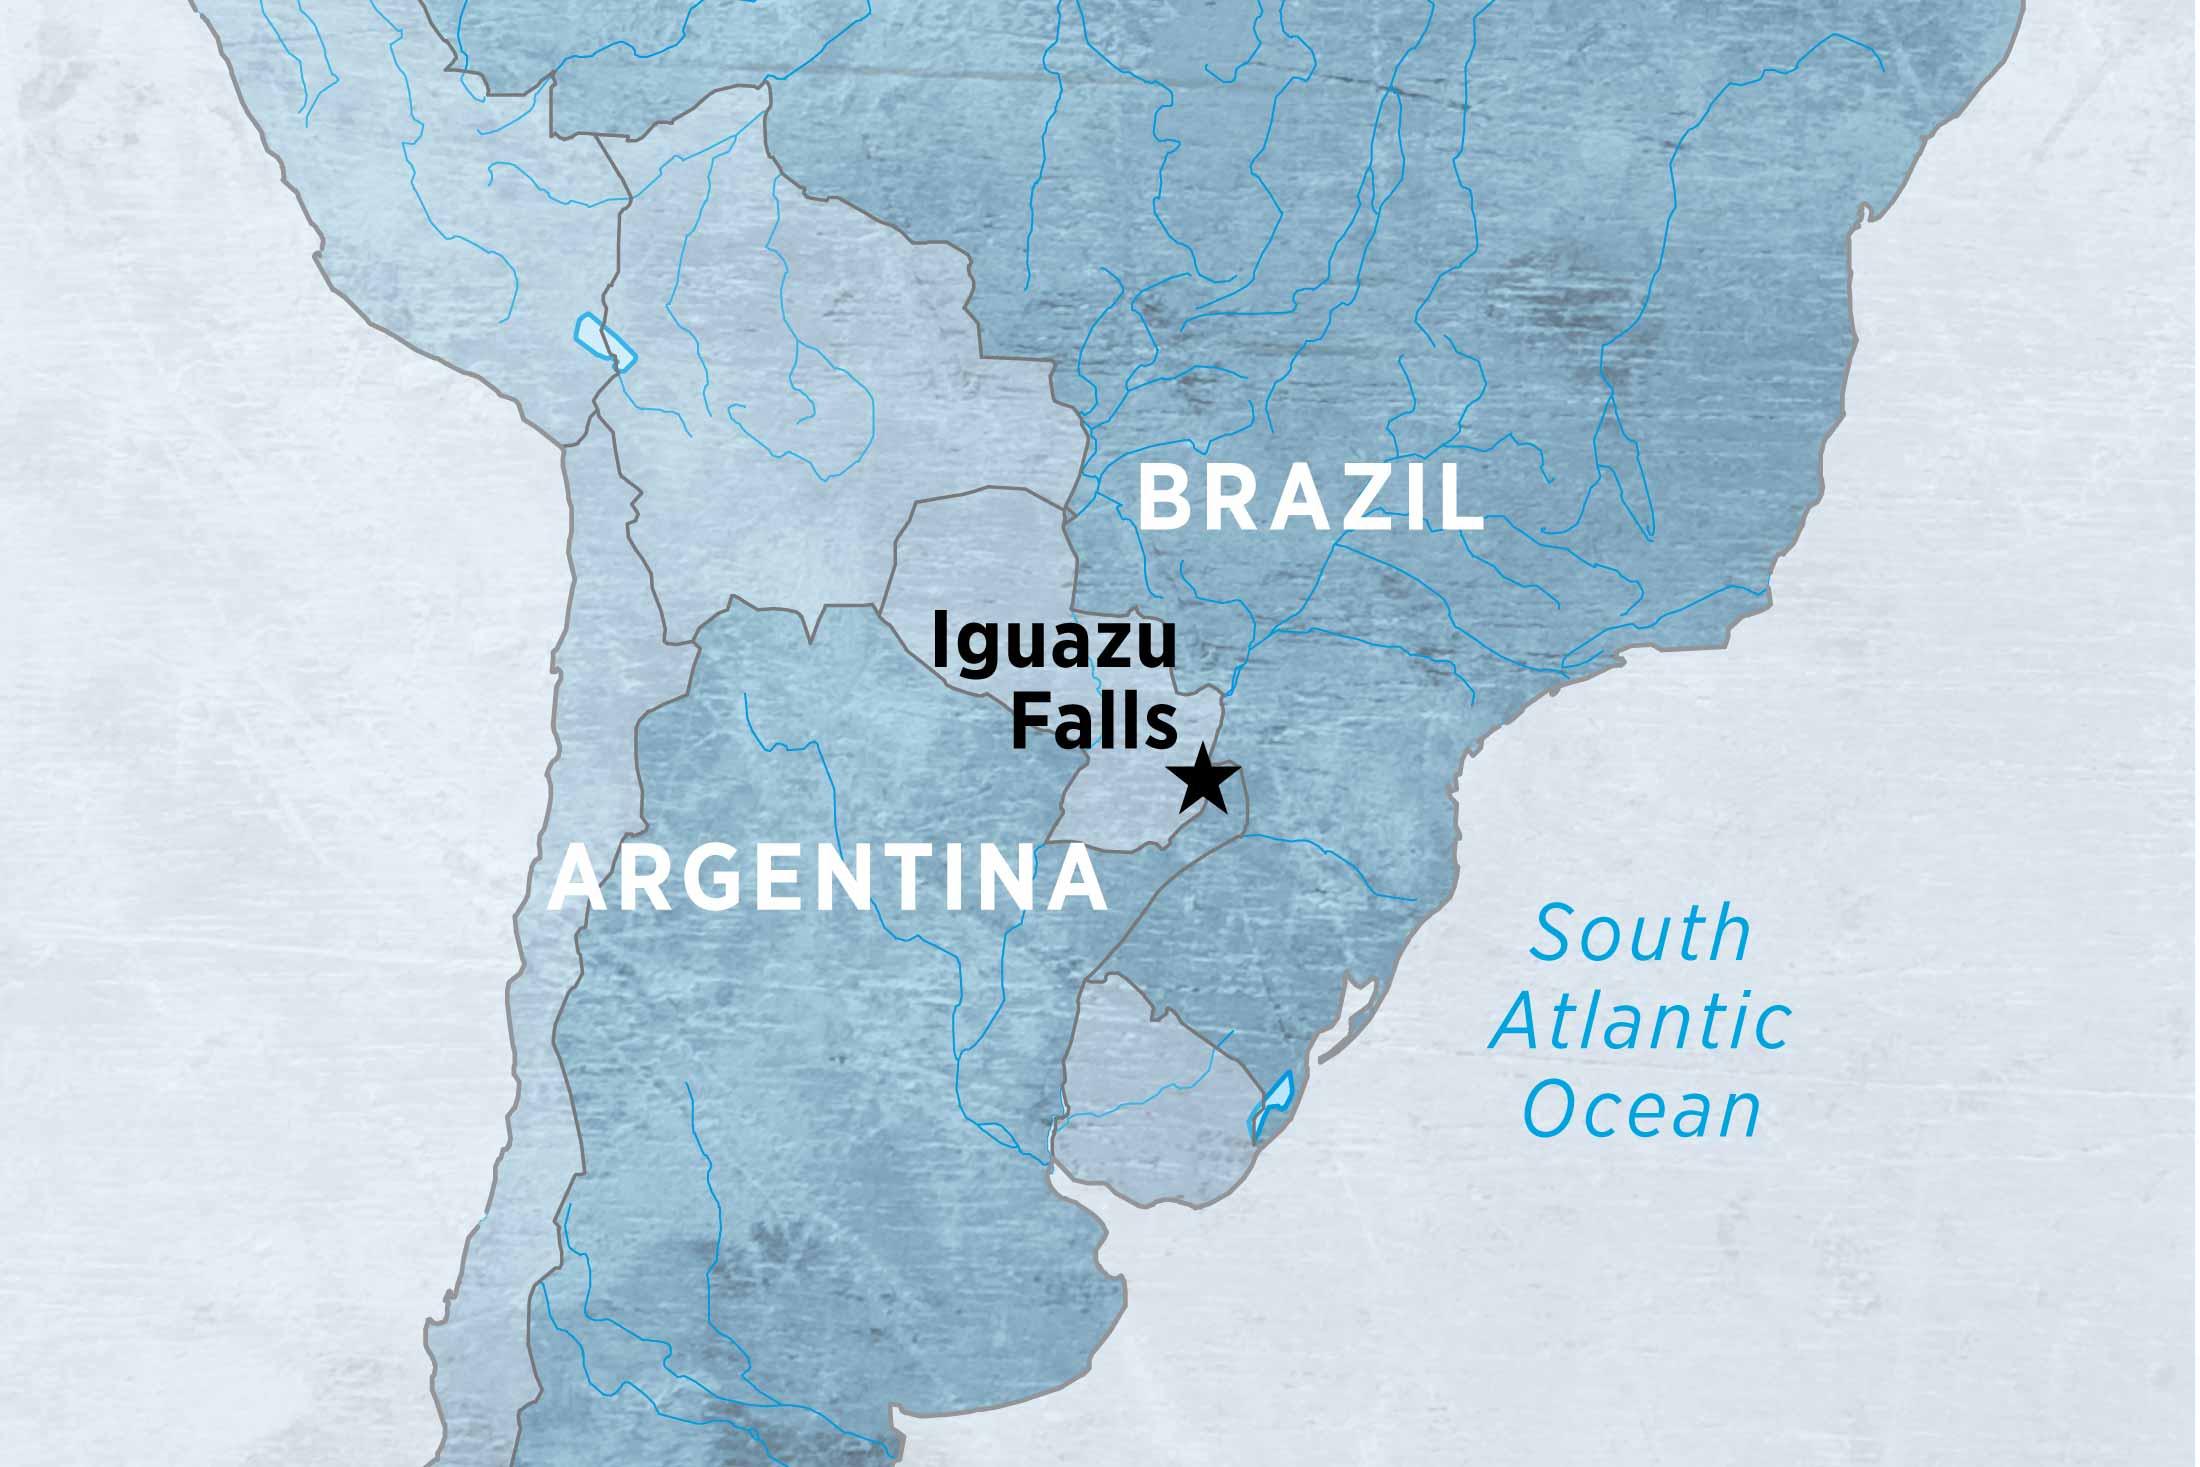 Iguazu Falls Experience - Independent